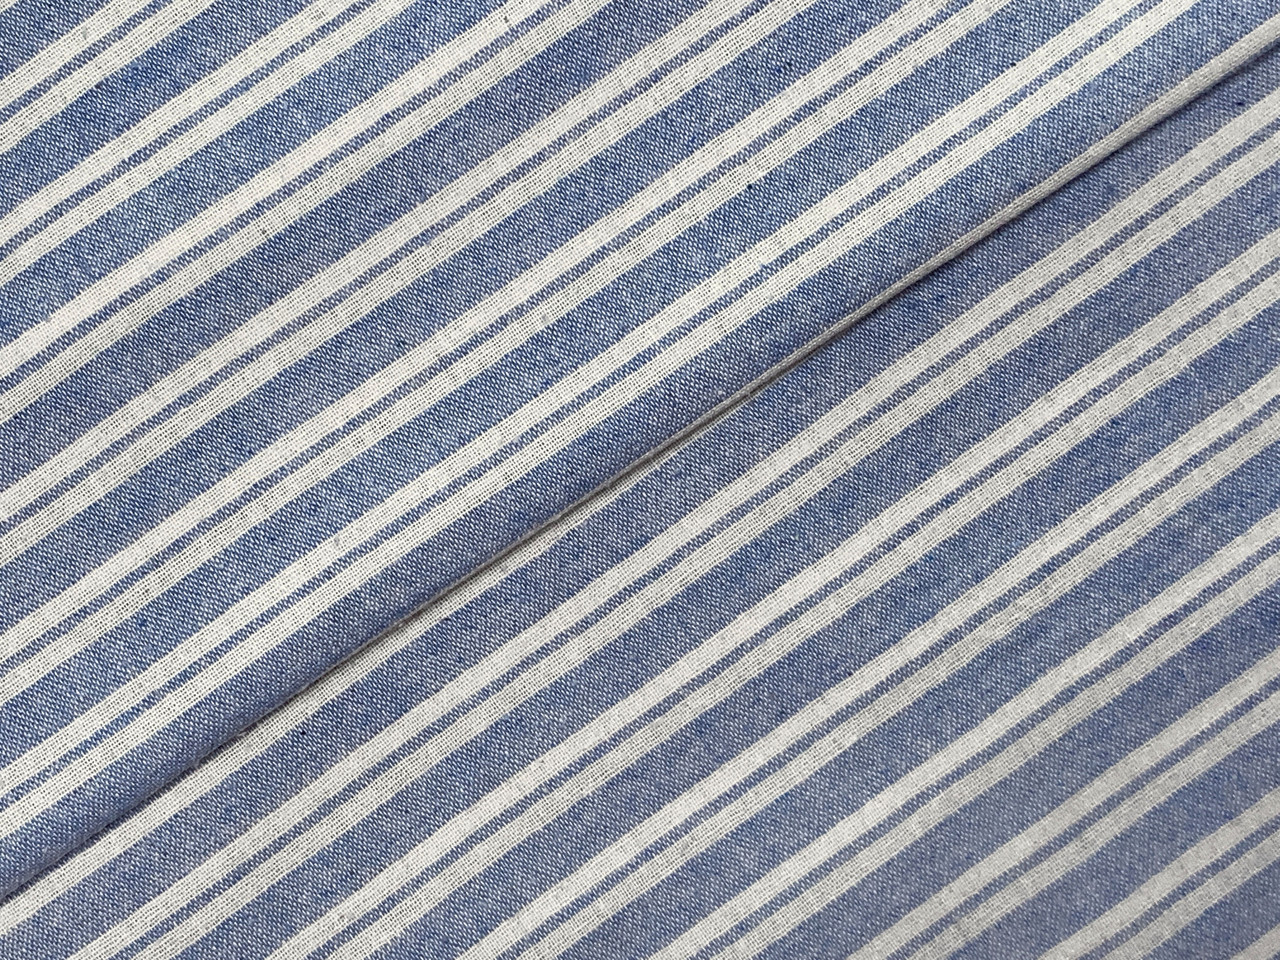 Коттон прованс полоска 10 мм, голубой на белом